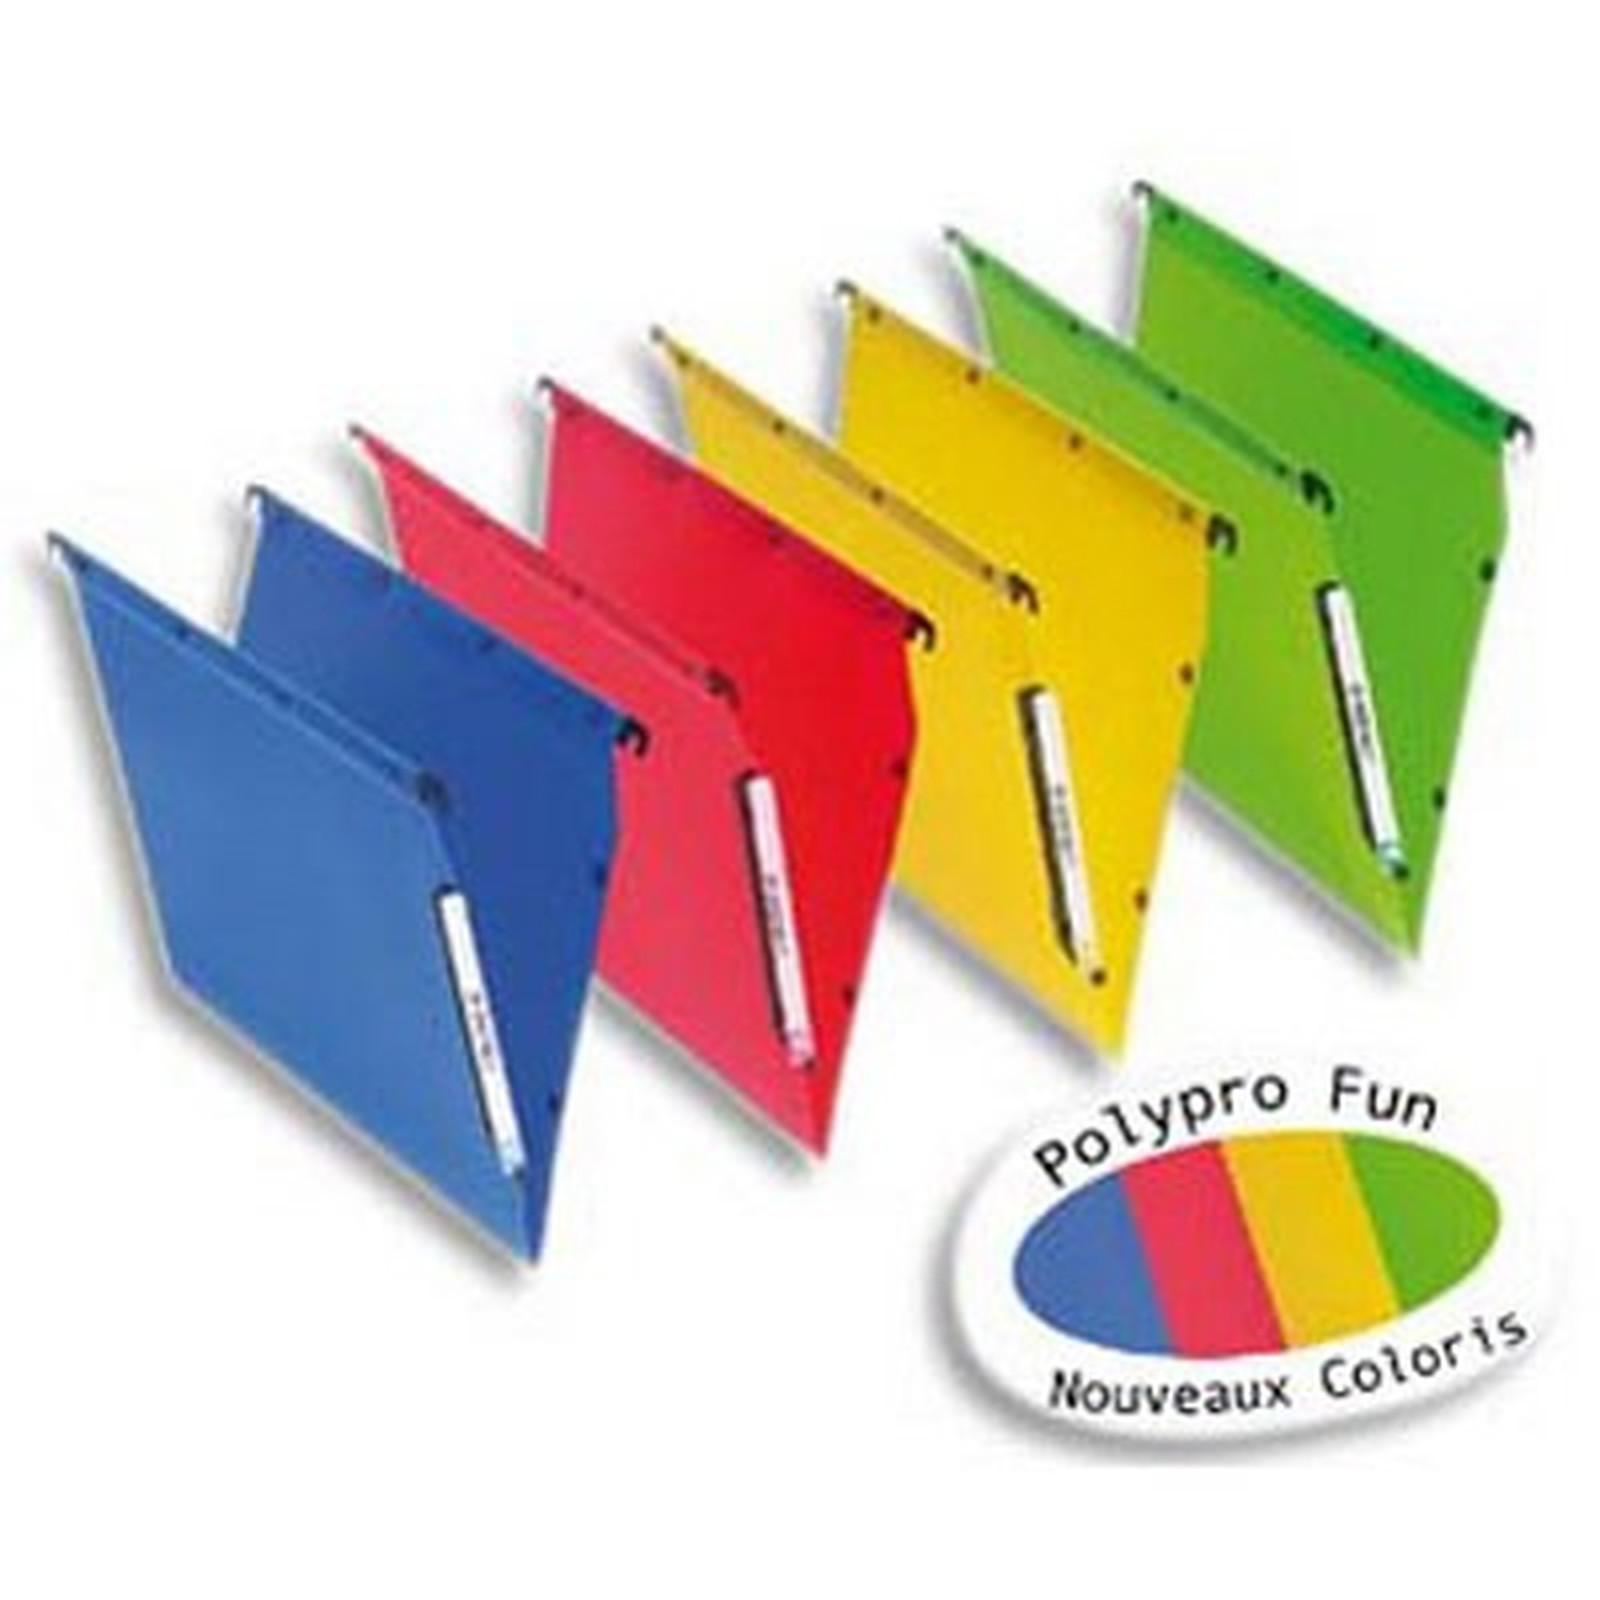 10 Dossiers suspendus fond 15 mm coloris assoris